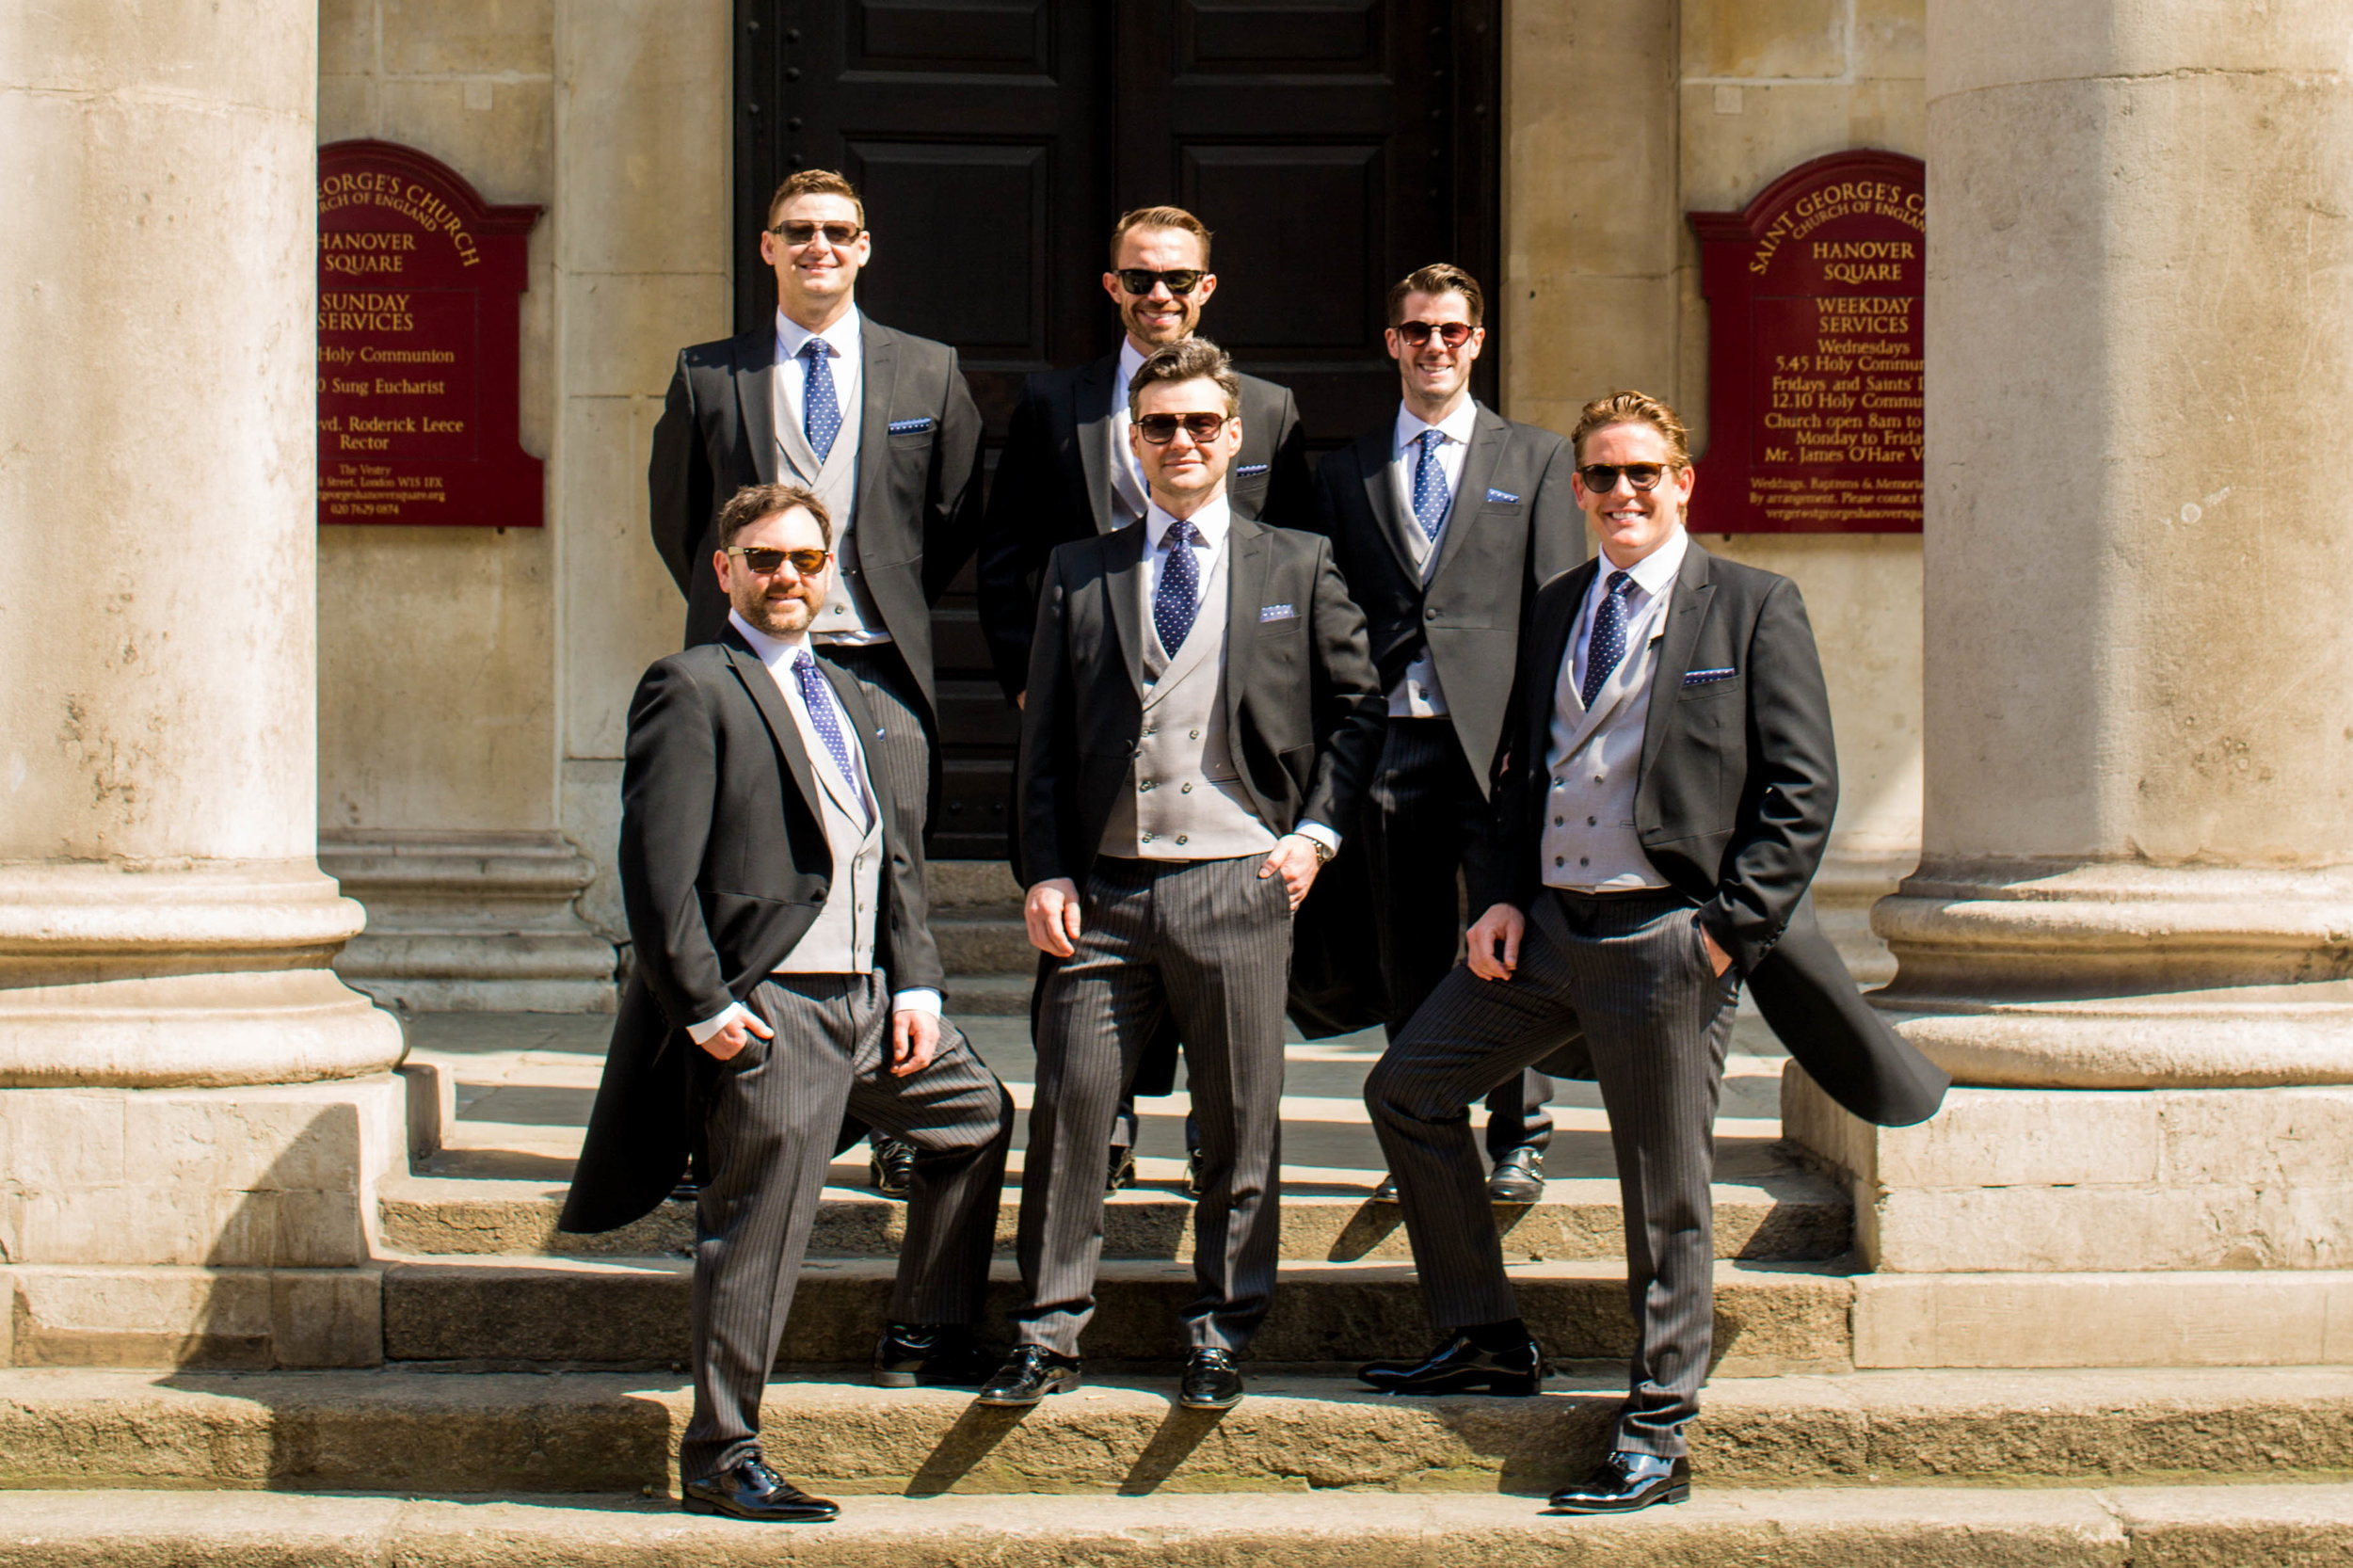 claridges-hotel-wedding-photographer-london-mayfair-natalia-smith-photography-38.jpg